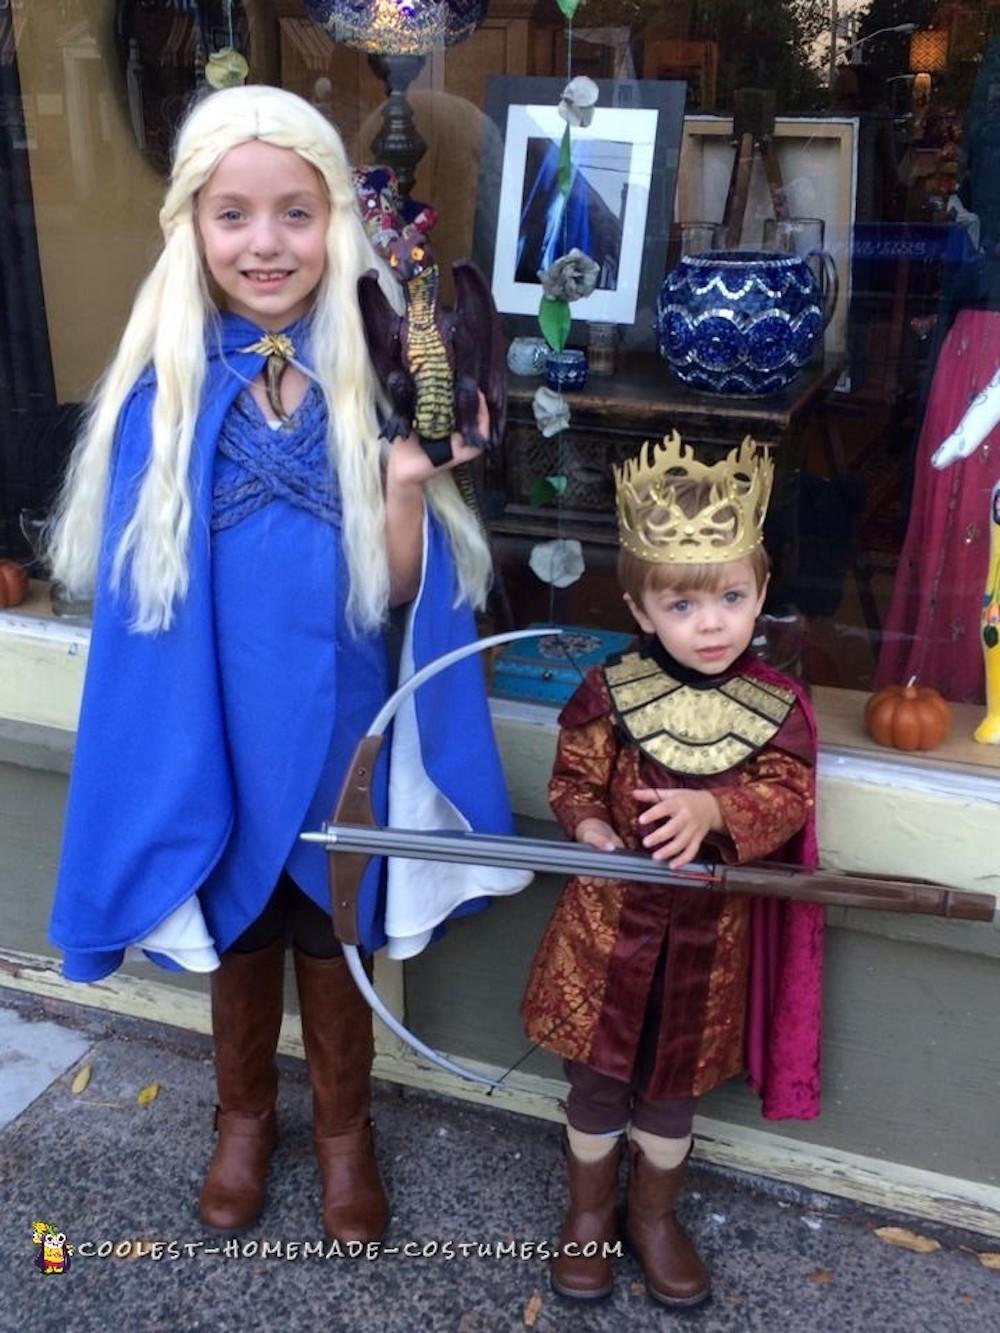 Kids' Game of Thrones costume ideas: How to make Khaleesi and Joffrey